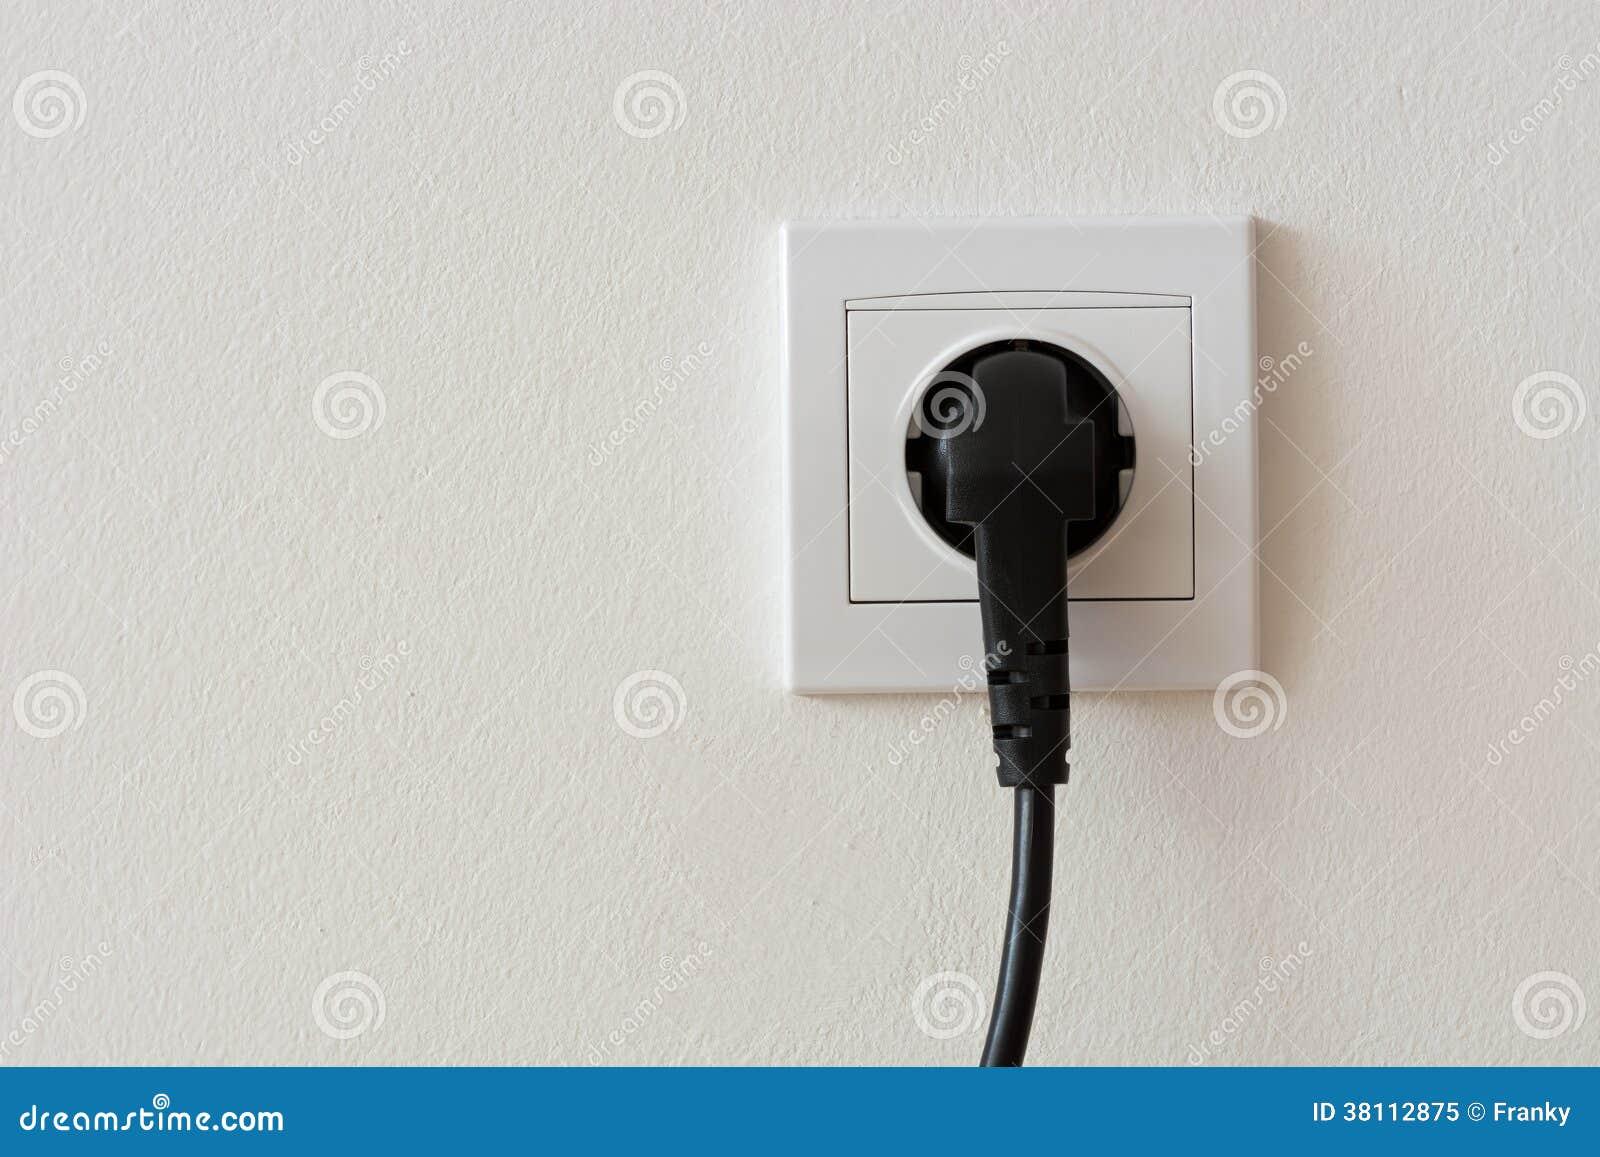 Black 220 Volt Power Plug Plugged In A Socket